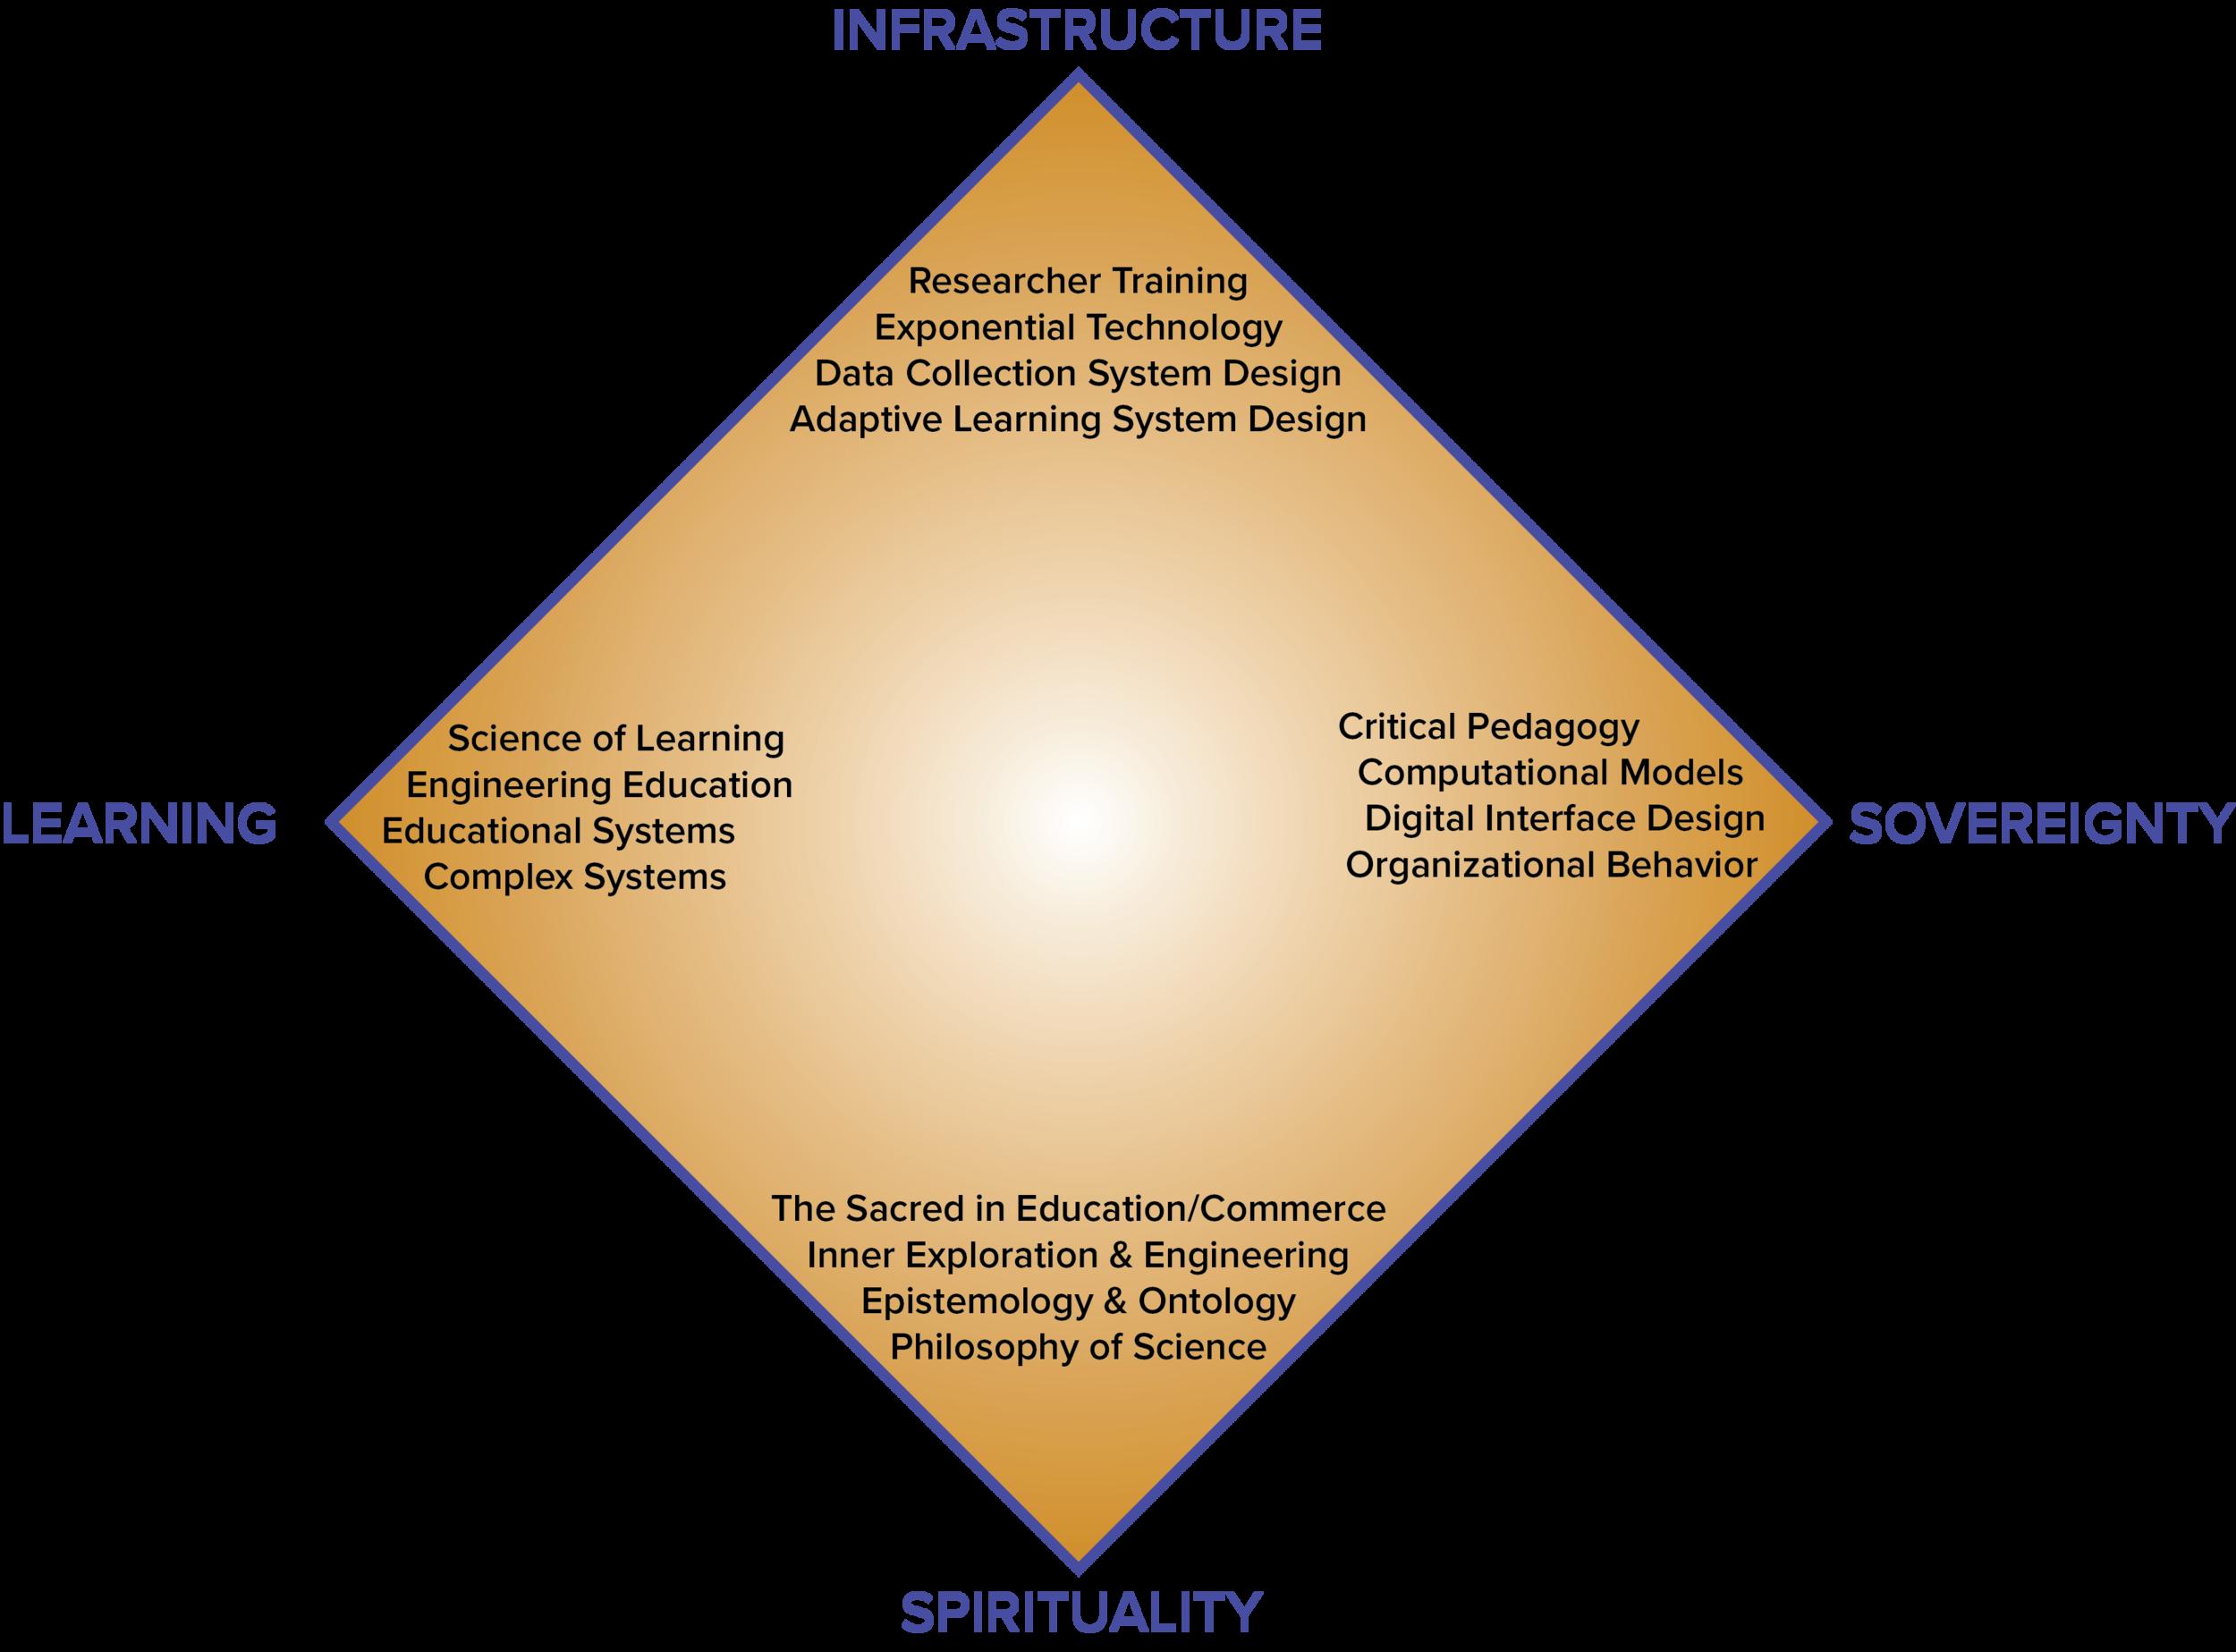 empredu_infrastructure_research_frame_diam.png